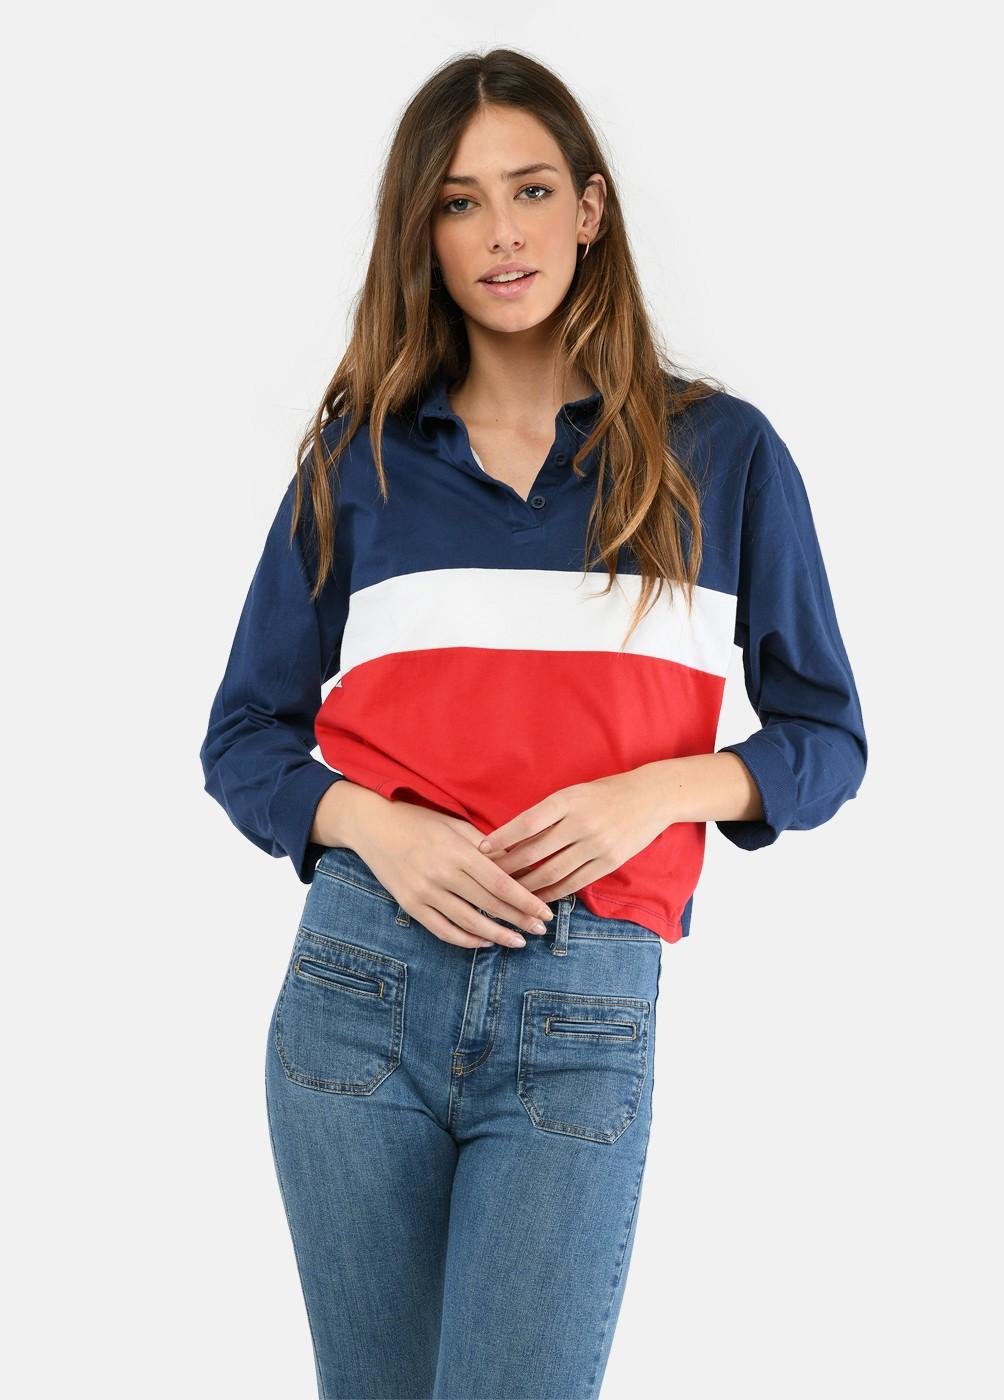 Camiseta Polo Duet Ml Franjas Colores